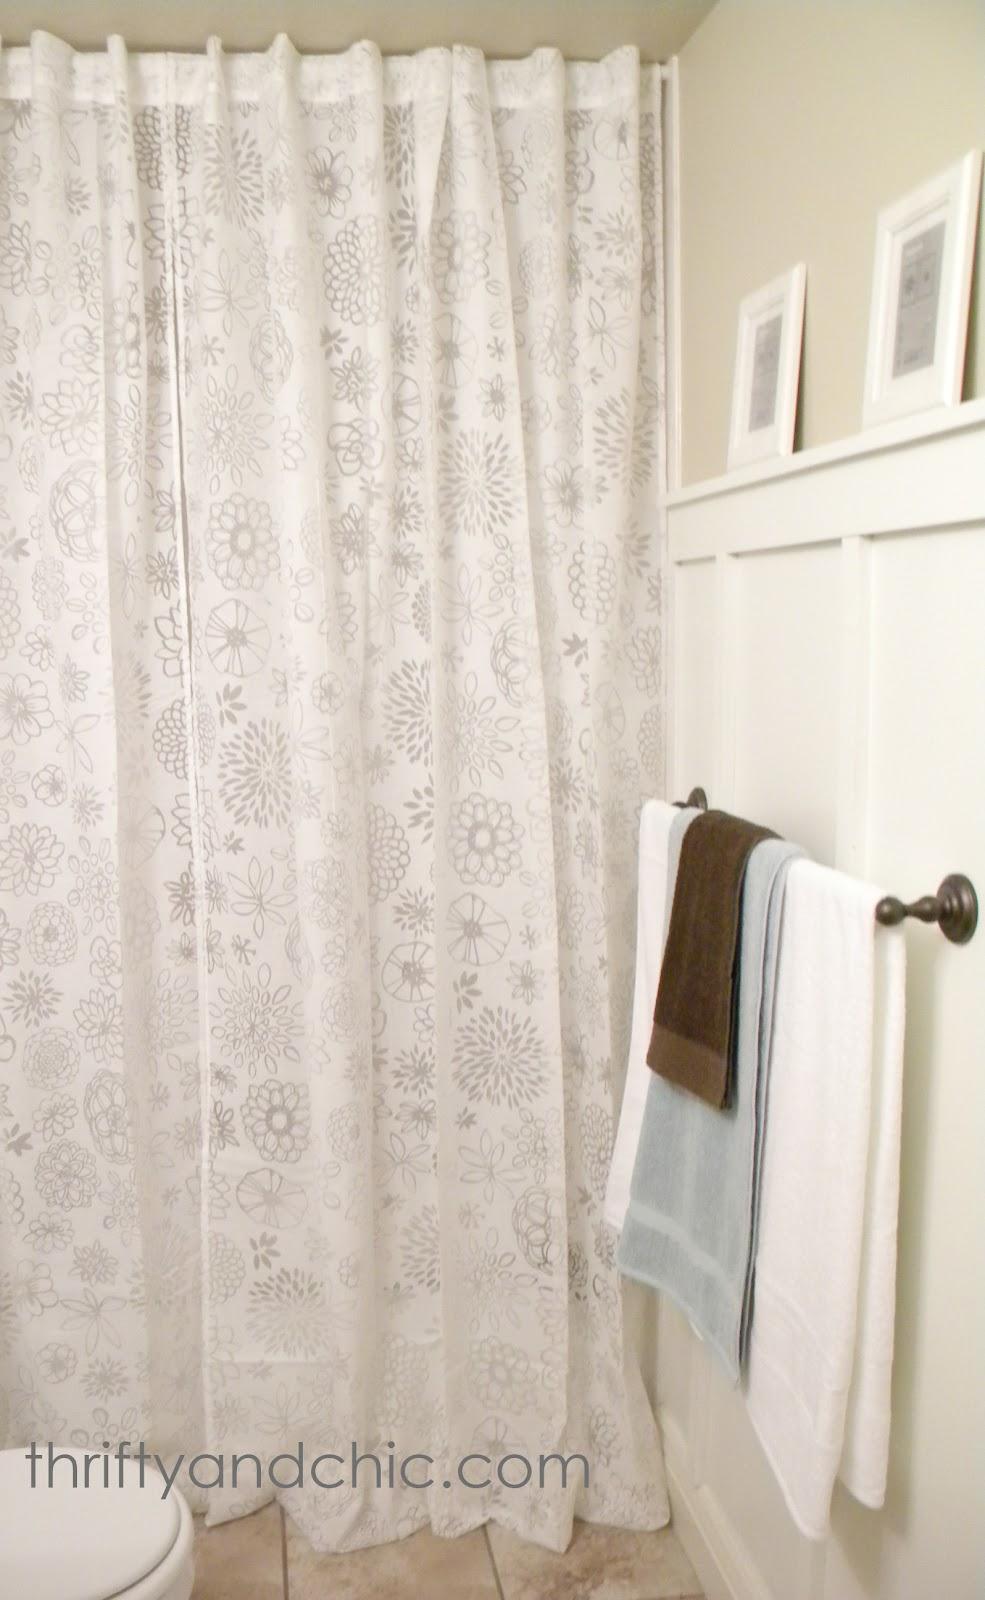 Diy shower curtain window treatment curtain menzilperde net for Bathroom curtains window treatments